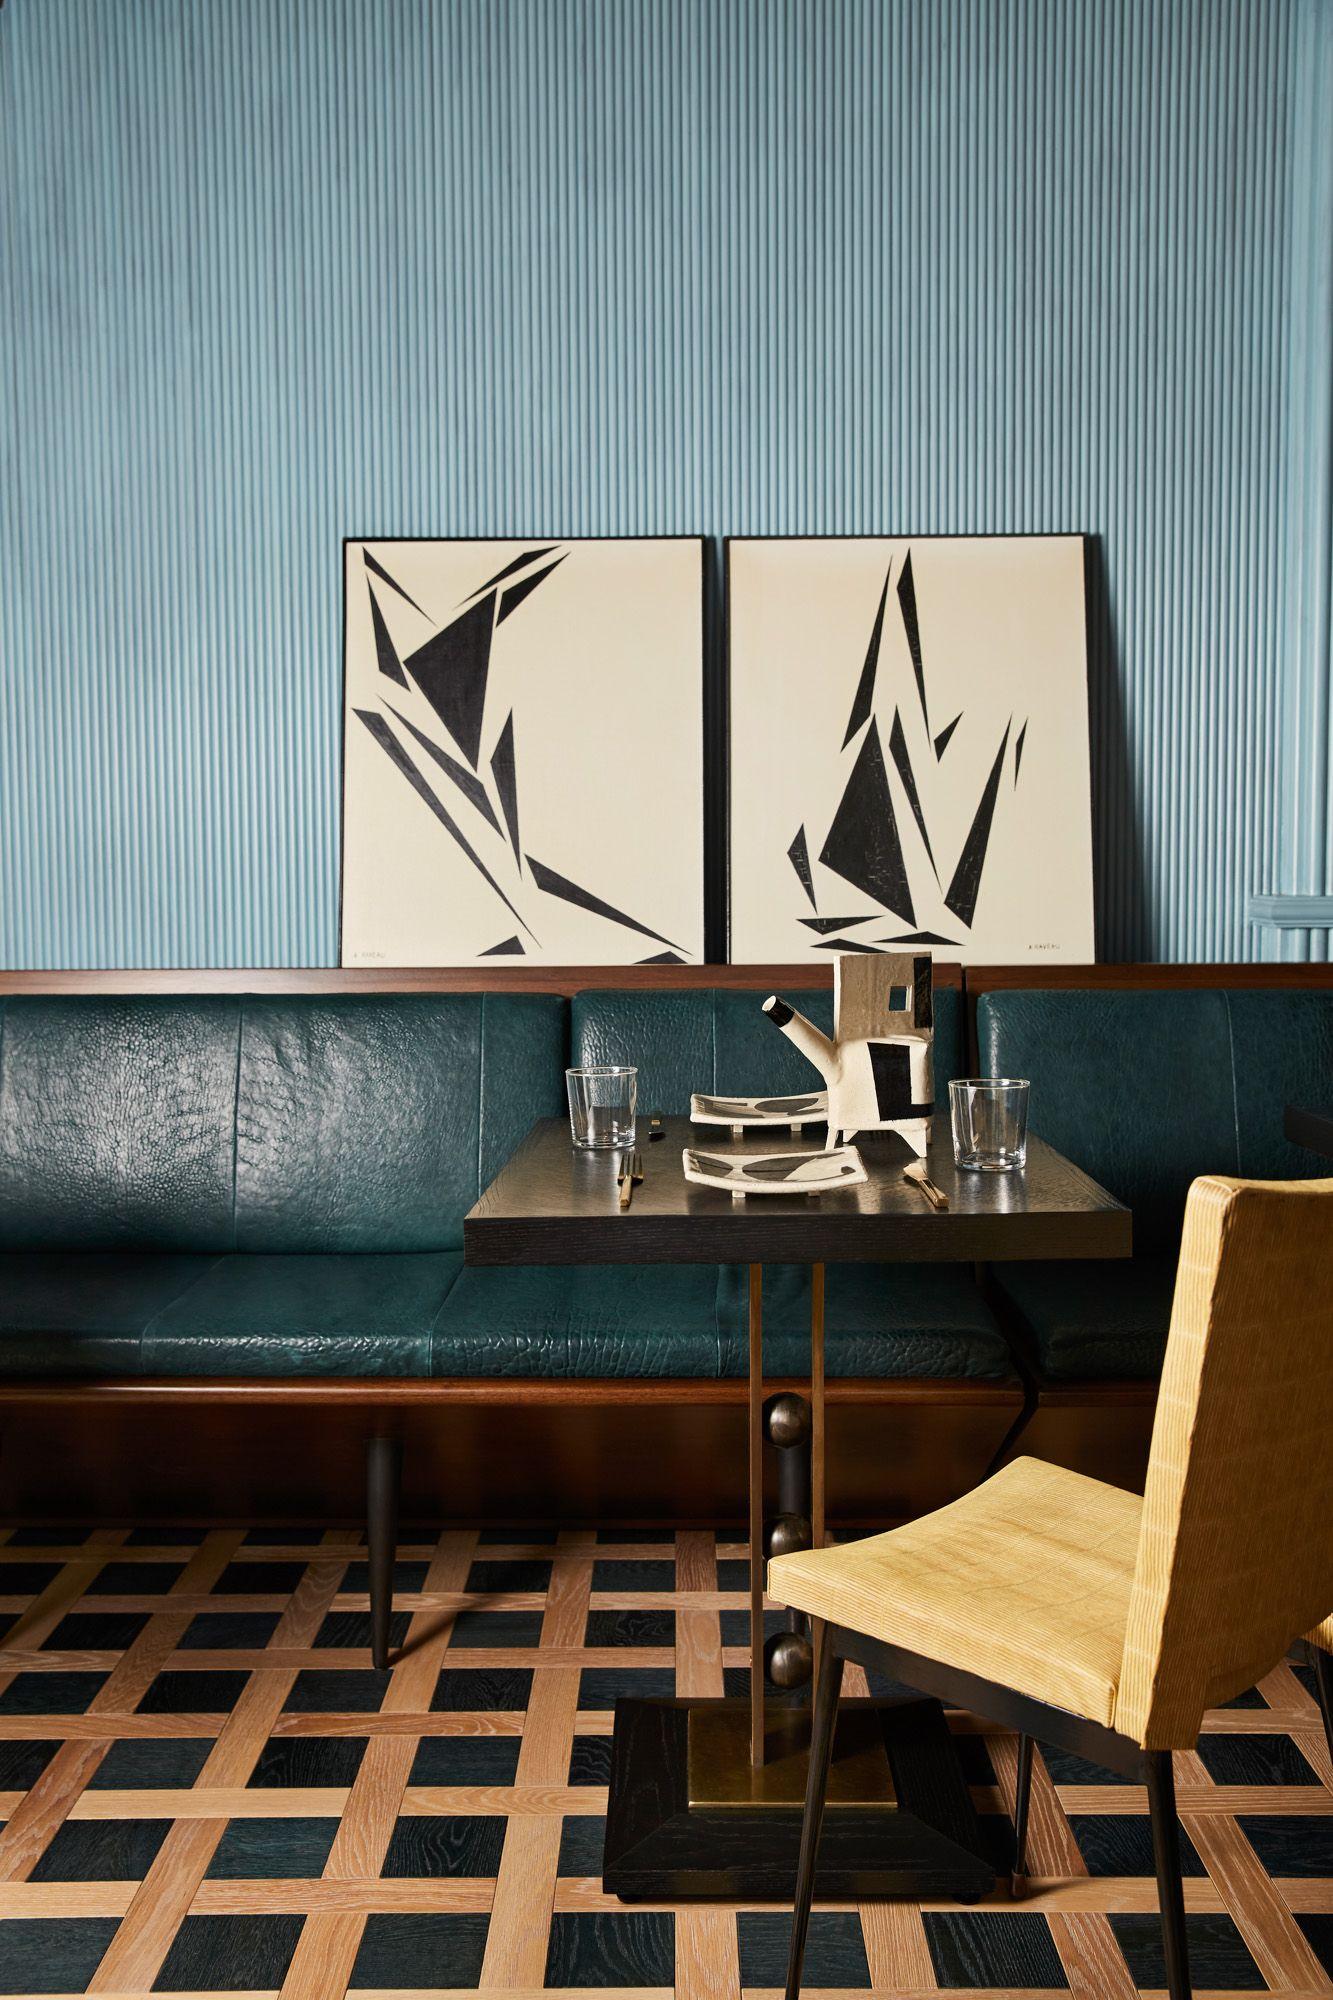 Artful dinner settings kellywearstlerinteriordesign interior design inspiration modern interior design color inspiration